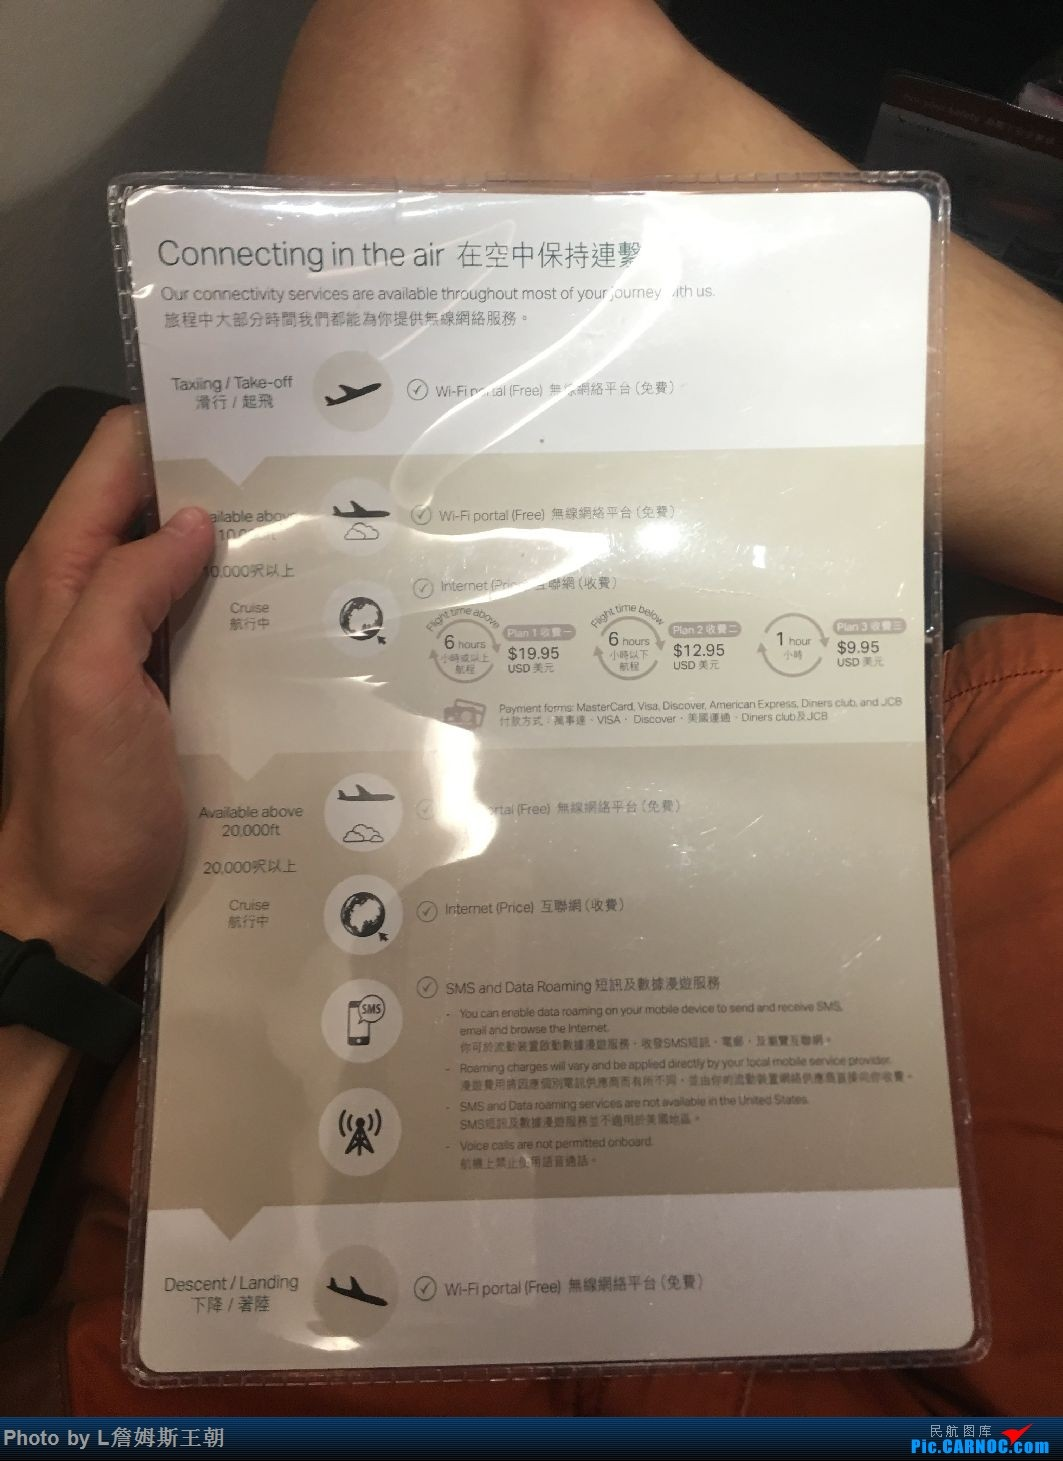 Re:[原创]【厦门飞友】King16:暑期泰国,大马游玩往返升舱。上集(国泰A359飞曼谷,升超经体验) AIRBUS A350-900 B-LRN